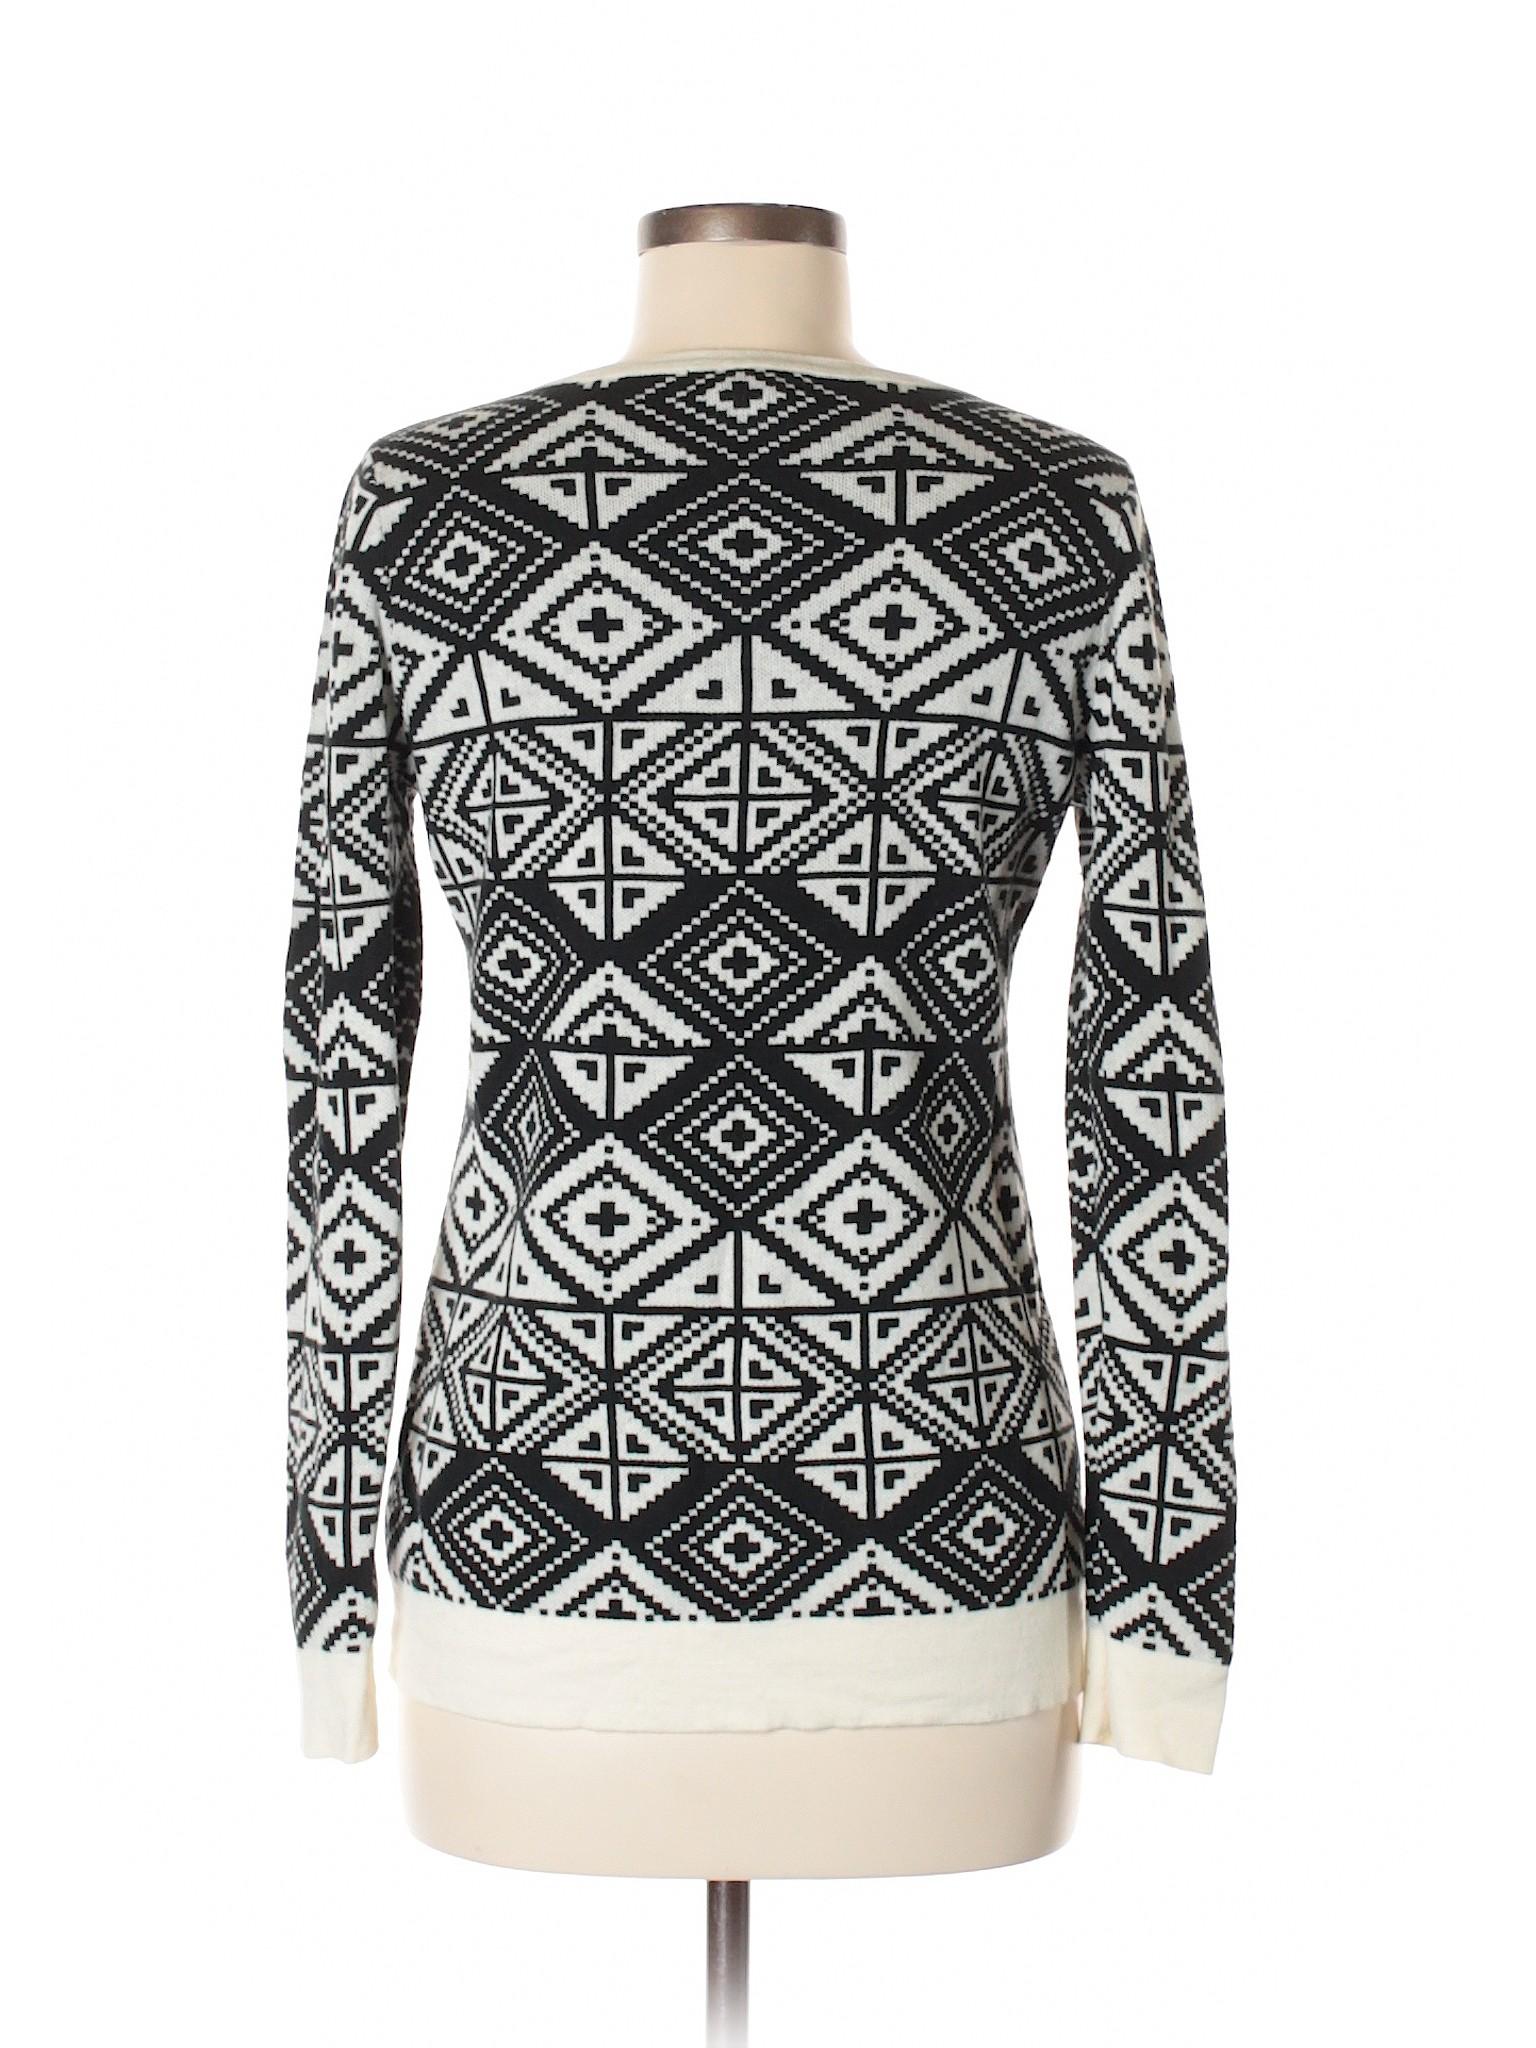 Boutique Boutique Sweater Banana Banana Republic Republic Pullover Pullover BTx1rqTtw